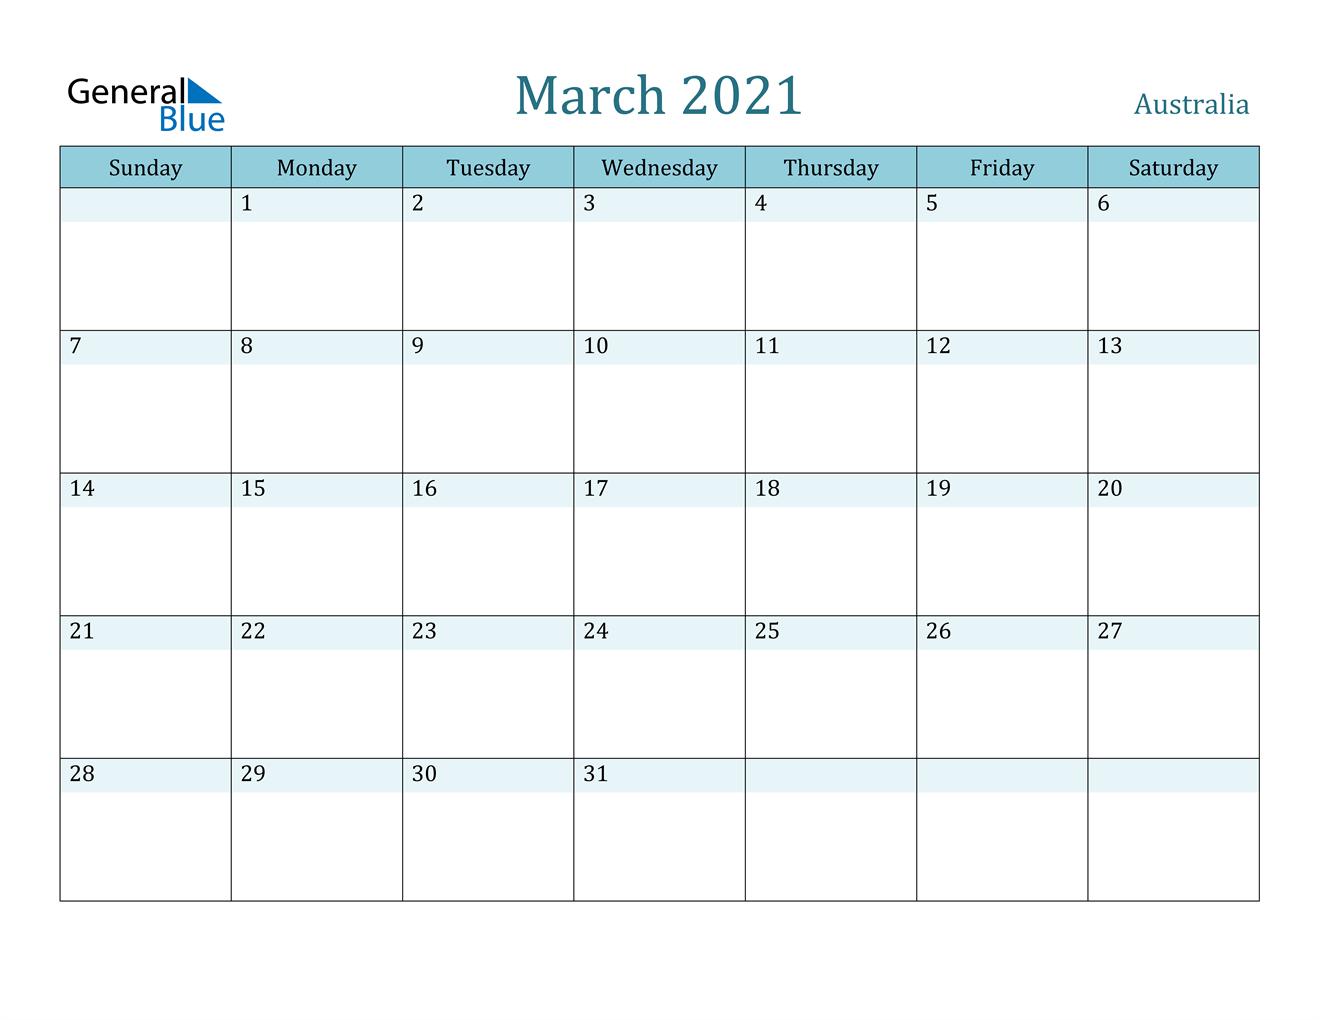 March 2021 Calendar - Australia